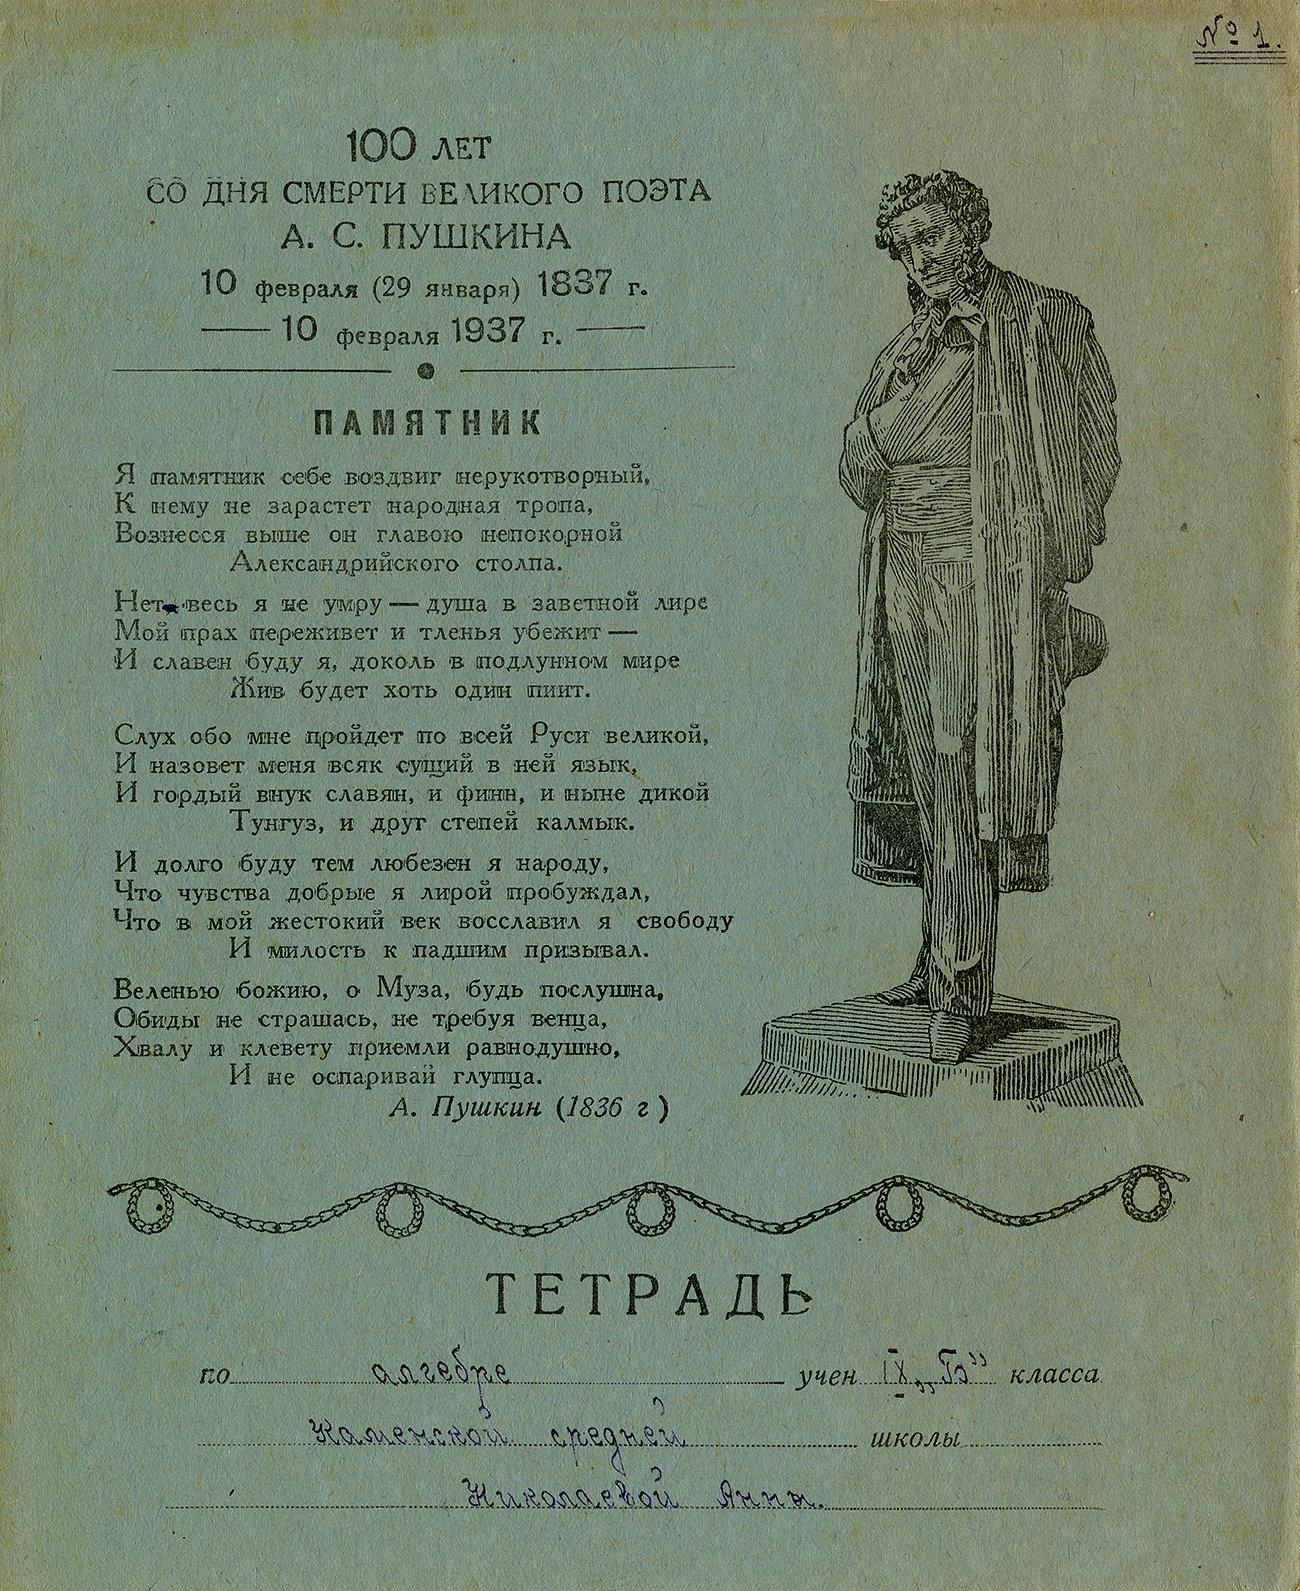 Пушкин Бесы зелёная 001